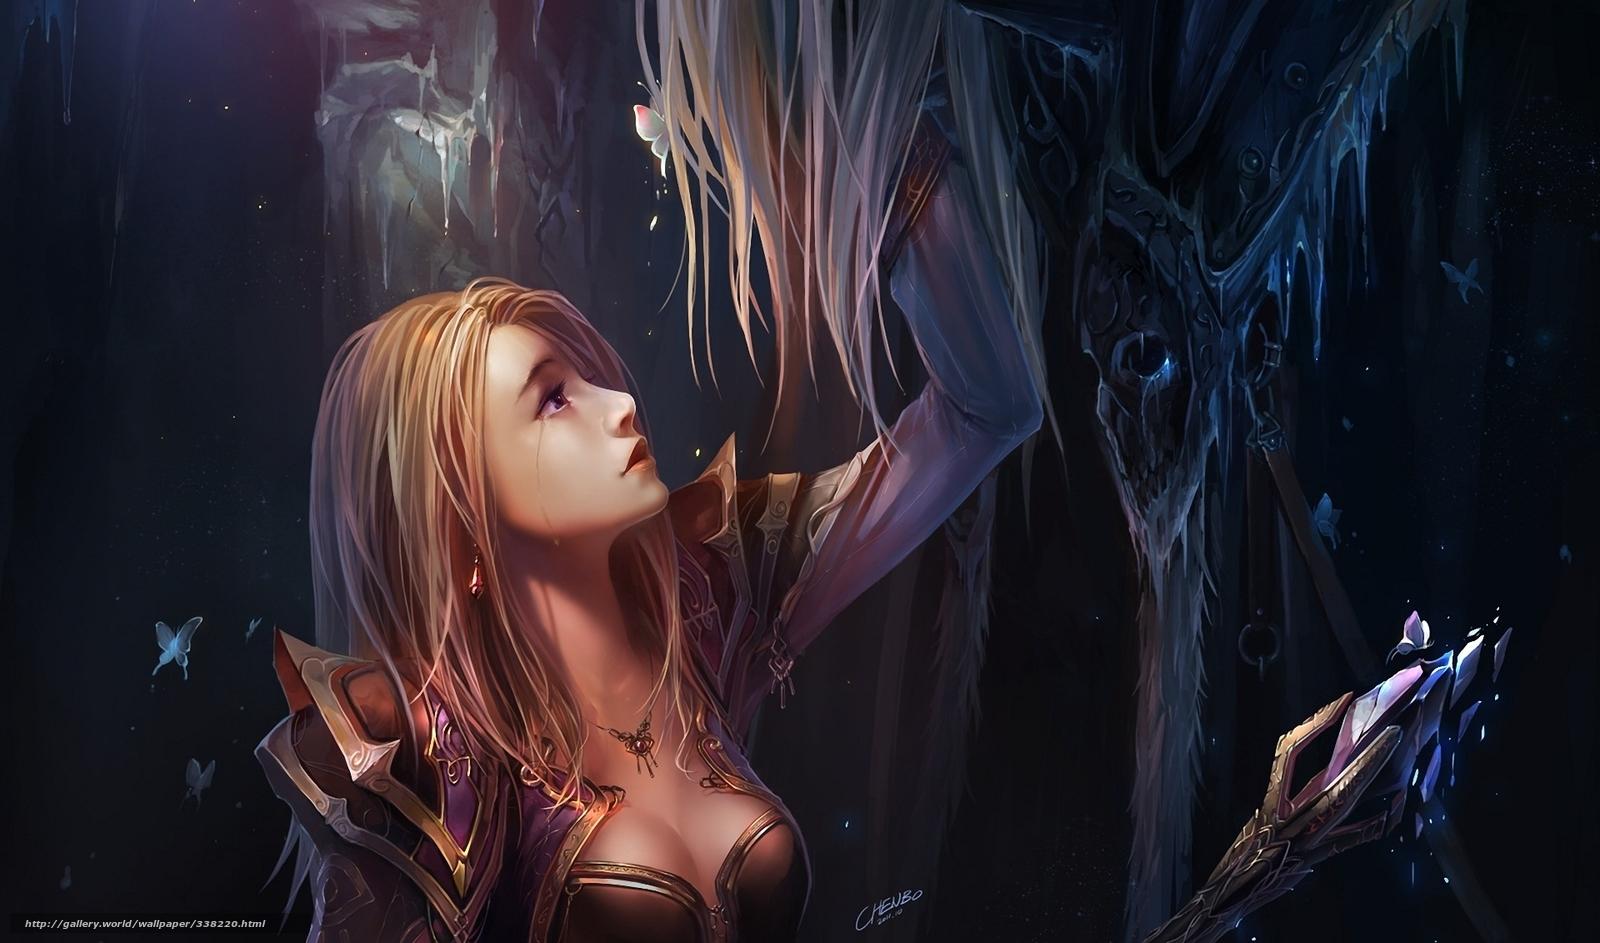 http://st.gdefon.com/wallpapers_original/wallpapers/338220_art_devushka_slezy_posox_kristall_razbityj_babochk_1920x1131_(GdeFon.ru).jpg